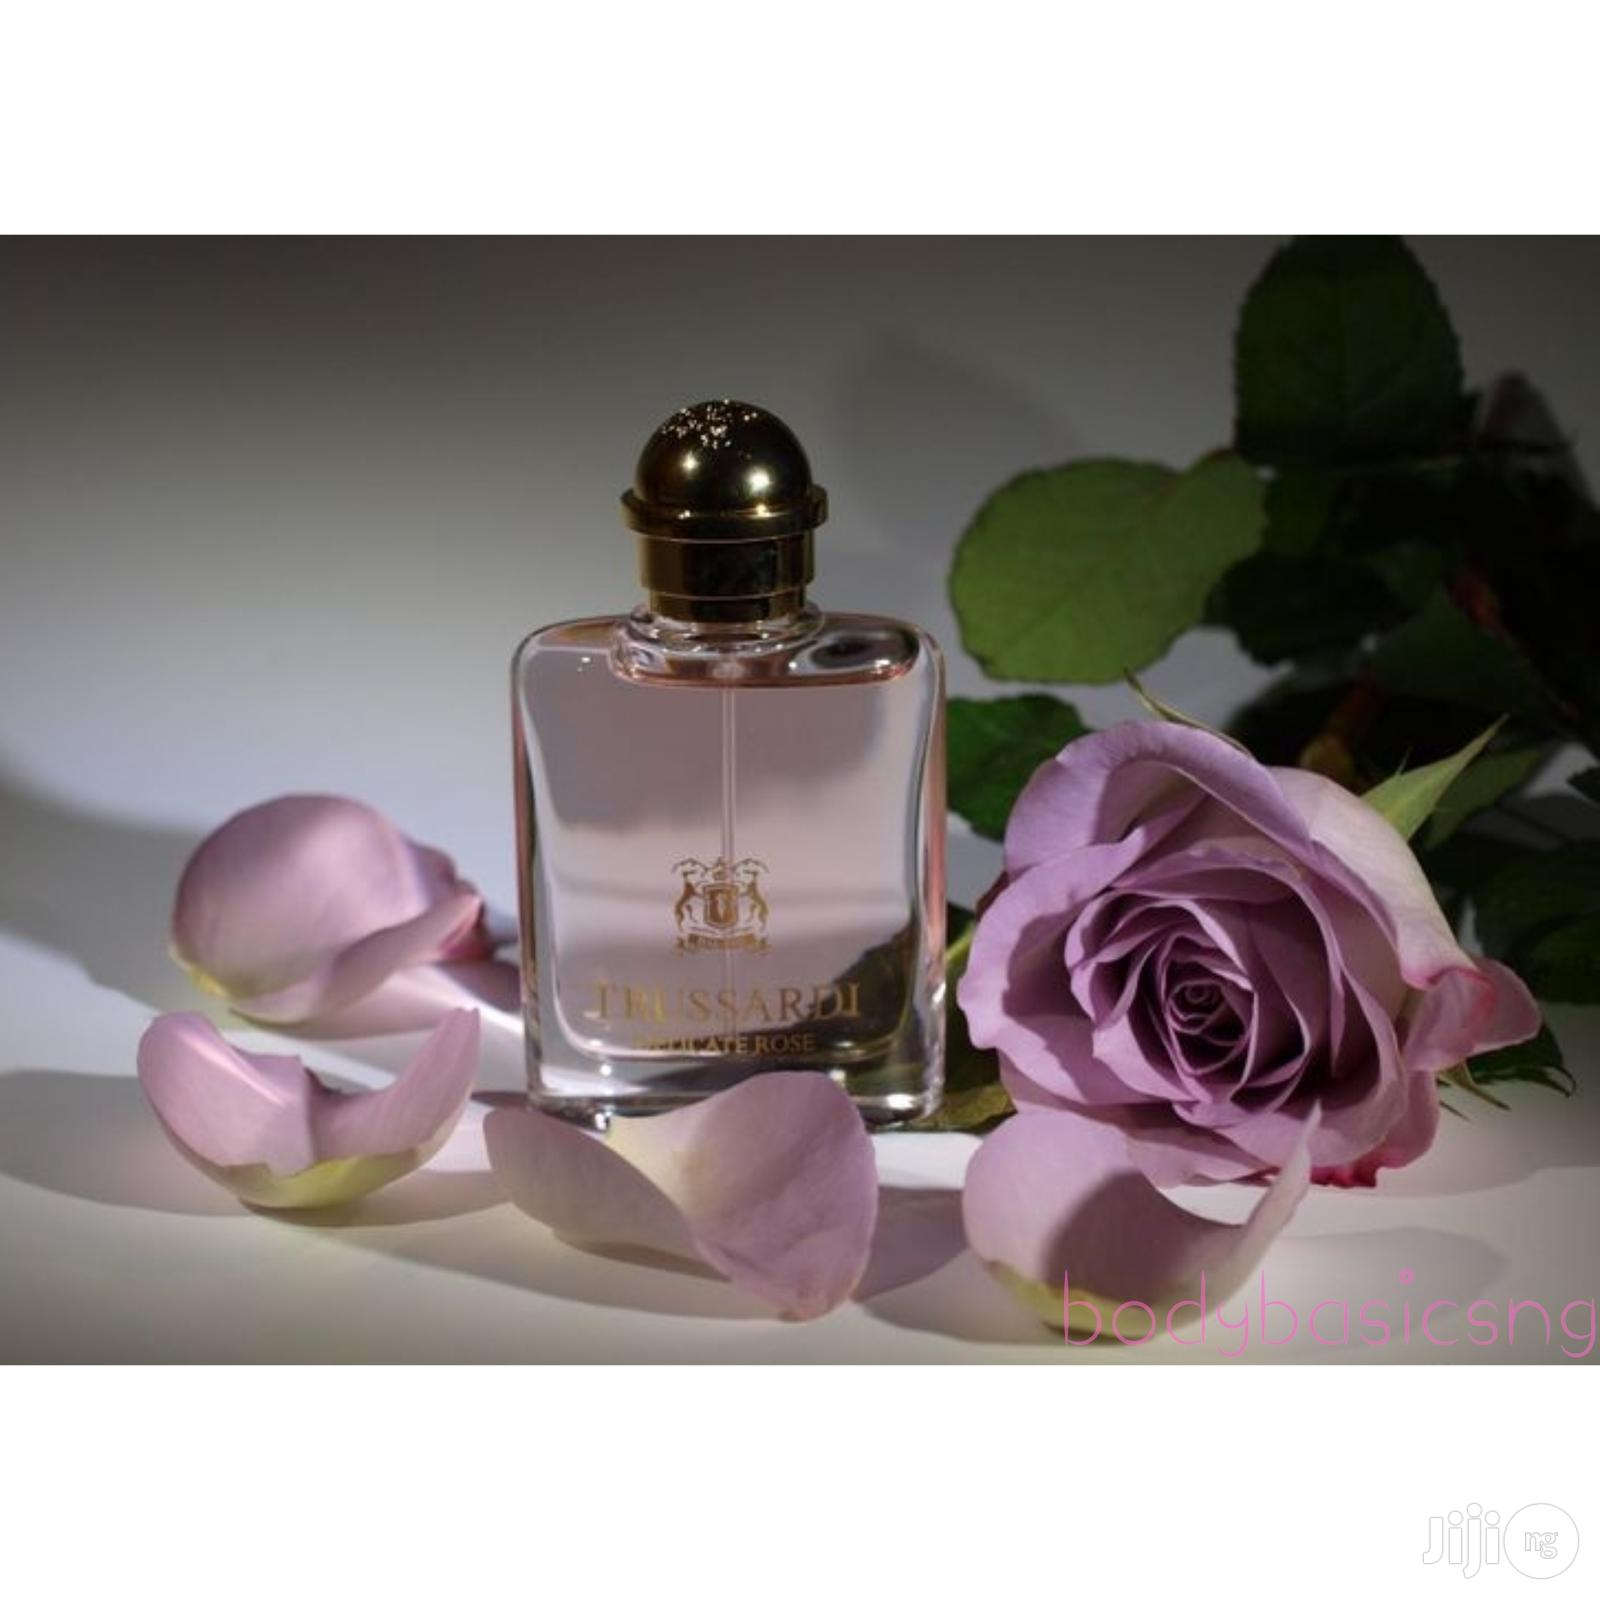 Trussardi Delicate Rose Oil 30ml Plus 2 Free Samples   Fragrance for sale in Isolo, Lagos State, Nigeria